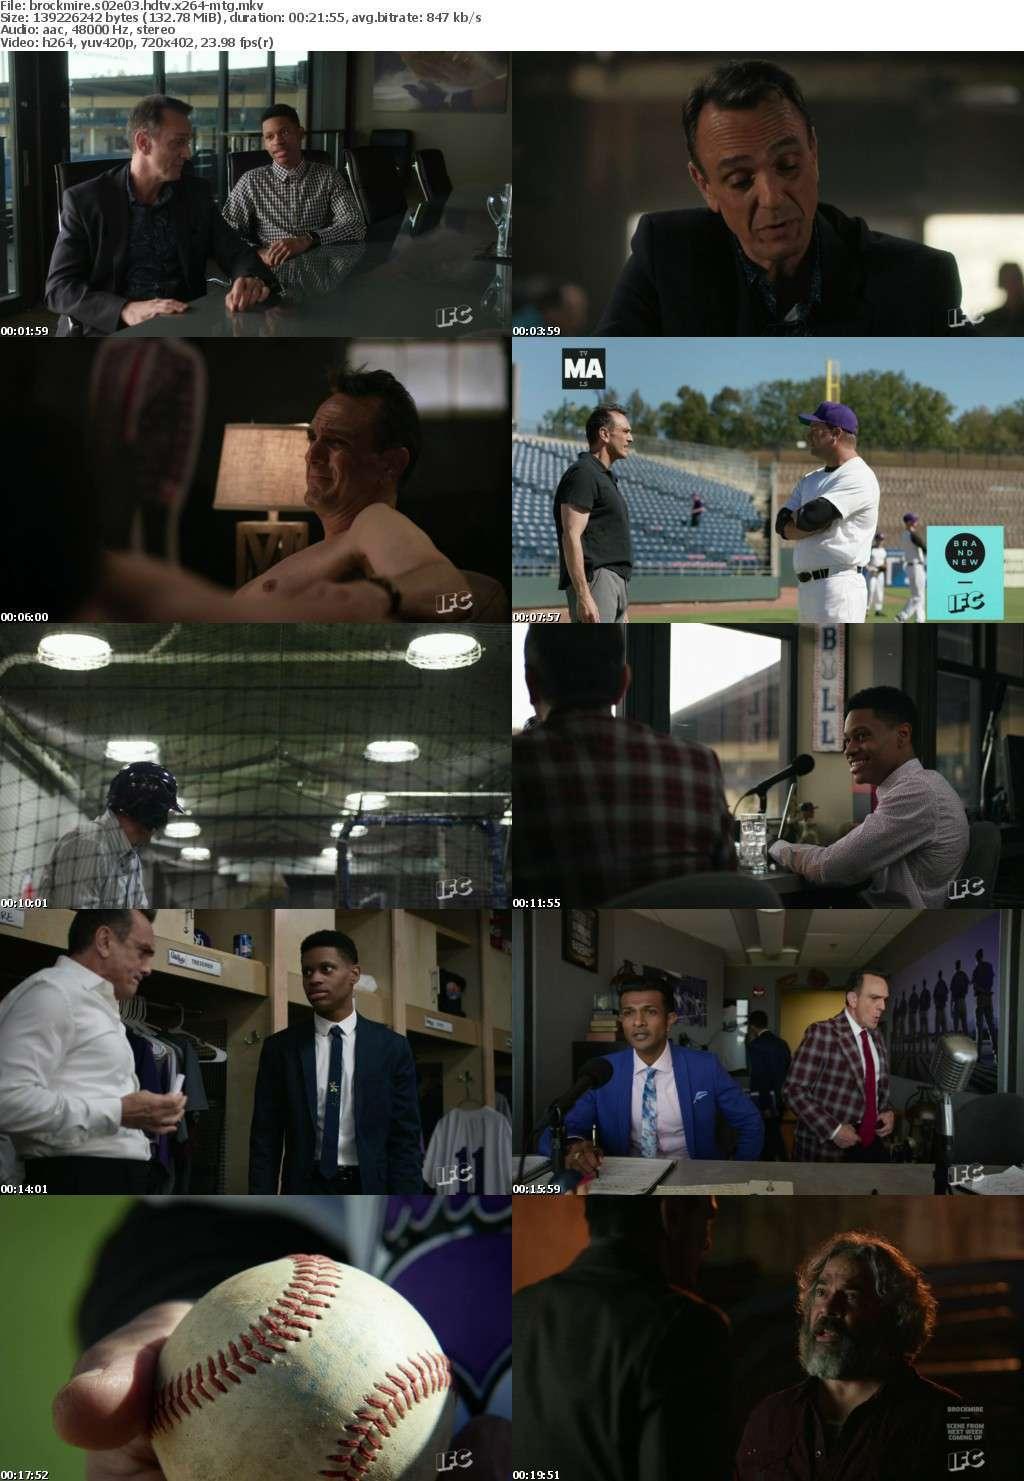 Brockmire S02E03 HDTV x264-MiNDTHEGAP